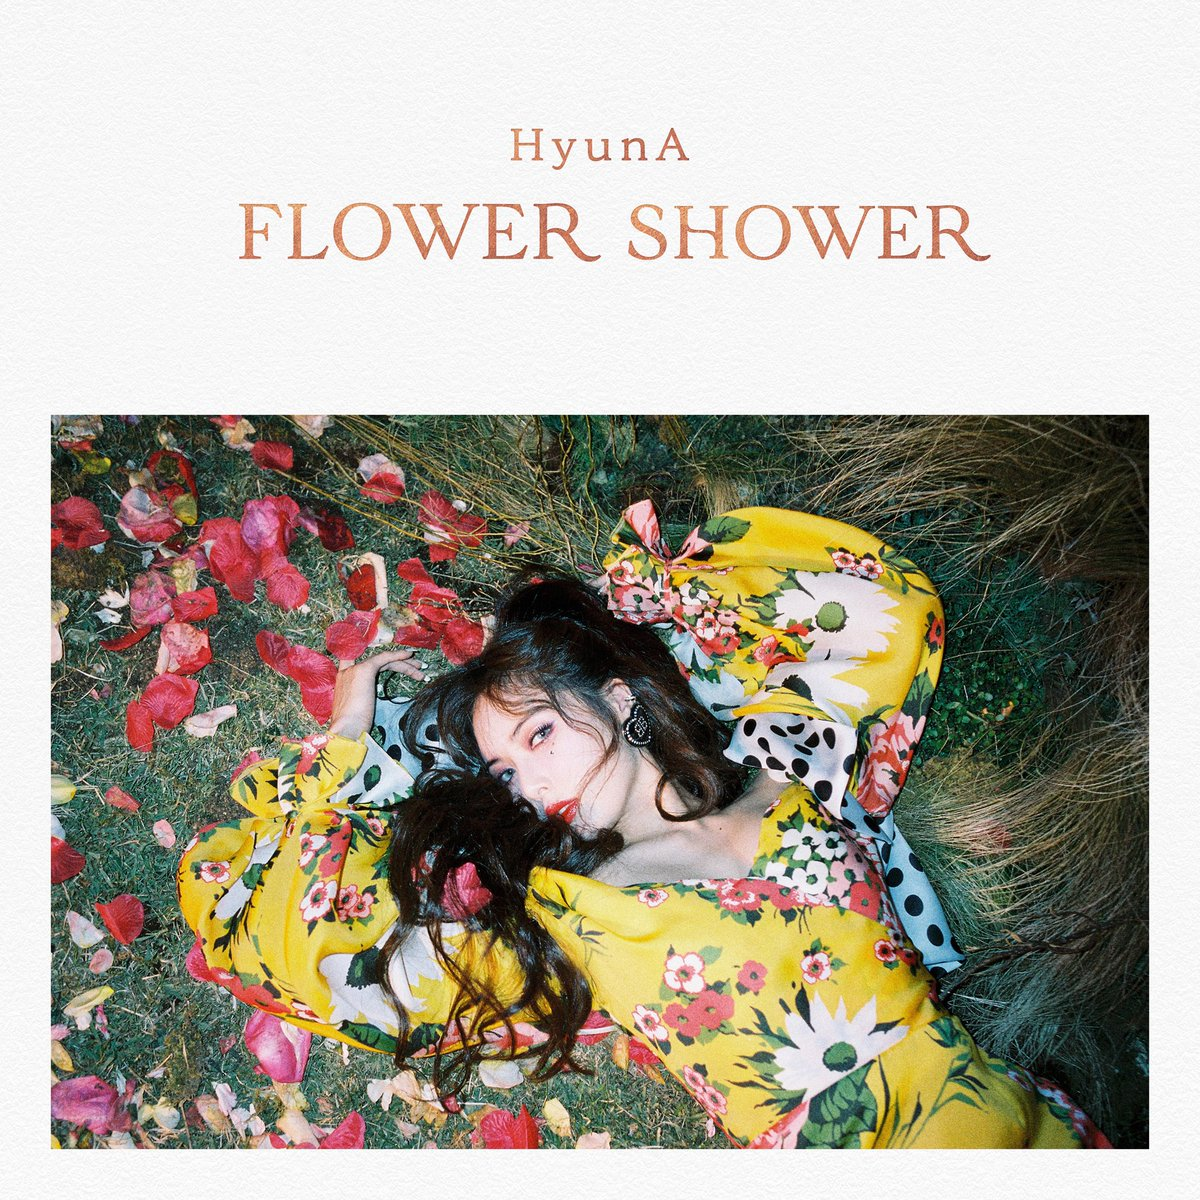 [HyunA] HyunA FLOWER SHOWER OUT NOW youtube.com/watch?v=8xqSz6… . . . #HyunA #현아 #FLOWERSHOWER #20191105 #0600pm_kst #PNATION